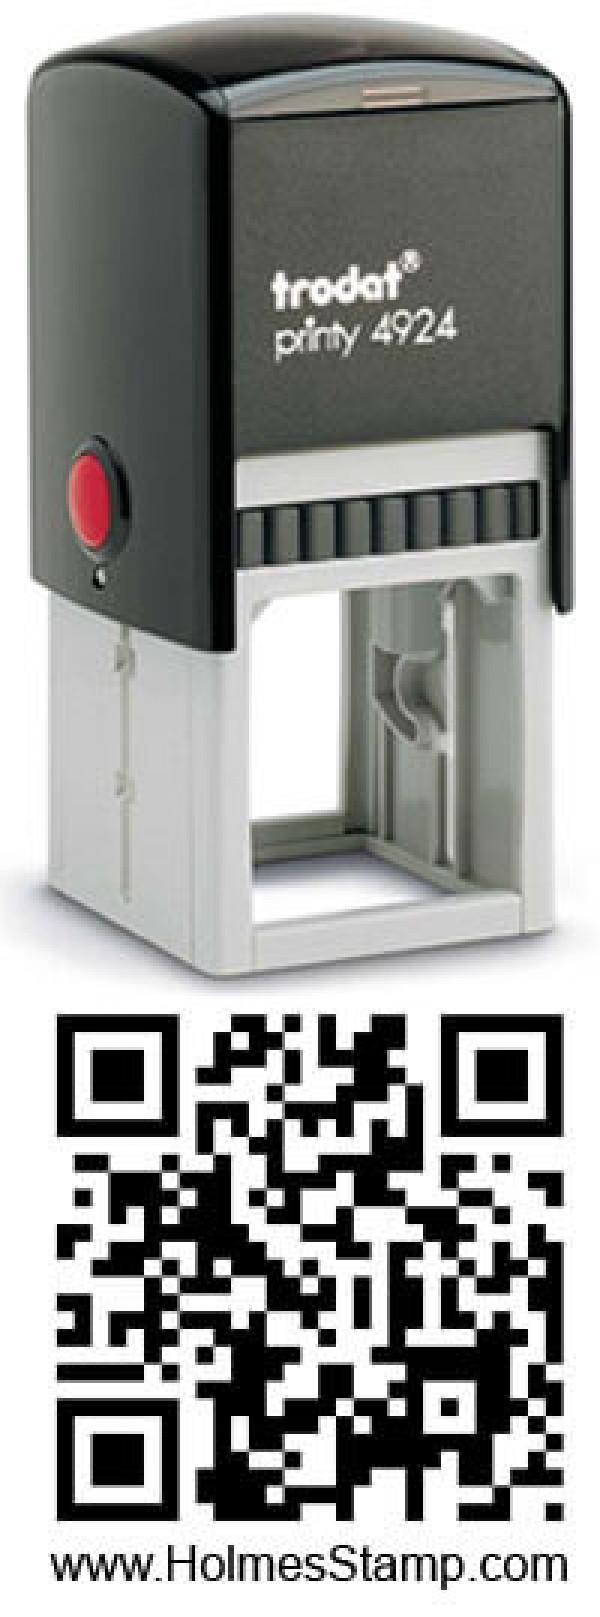 Square QR Code Stamp